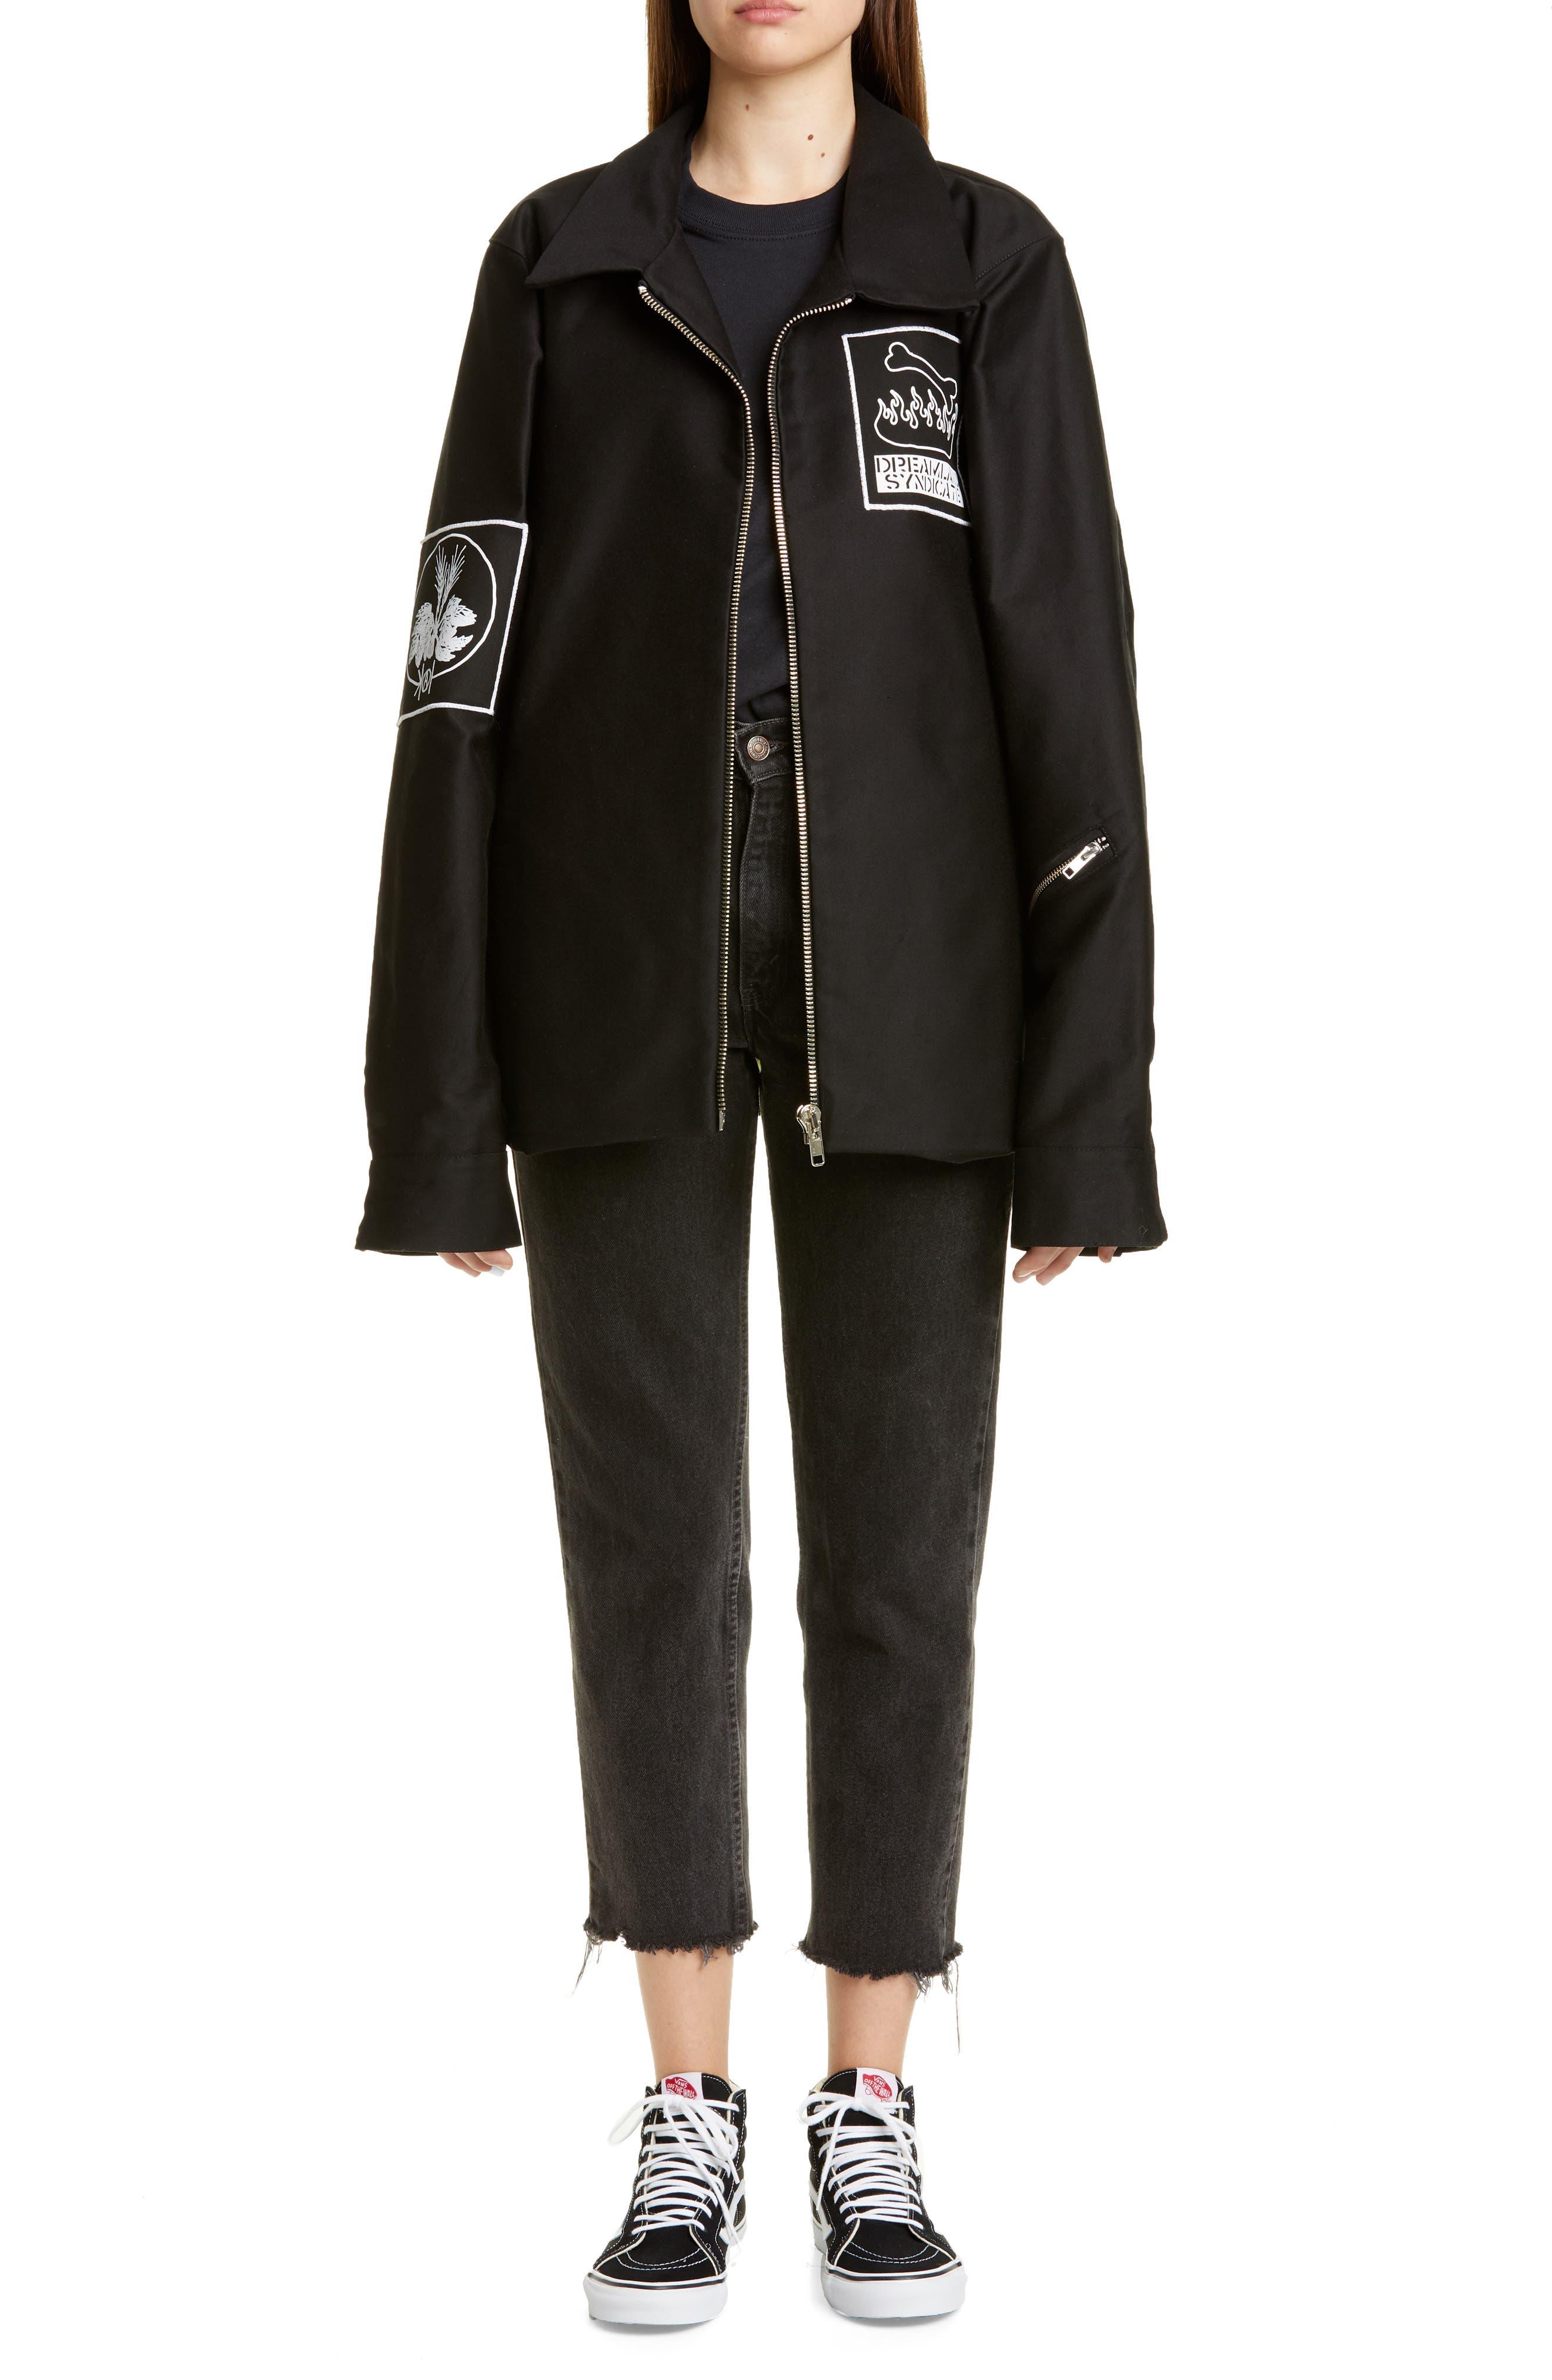 VANS, Sk8-Hi Slim High Top Sneaker, Alternate thumbnail 2, color, BLACK TRUE WHITE